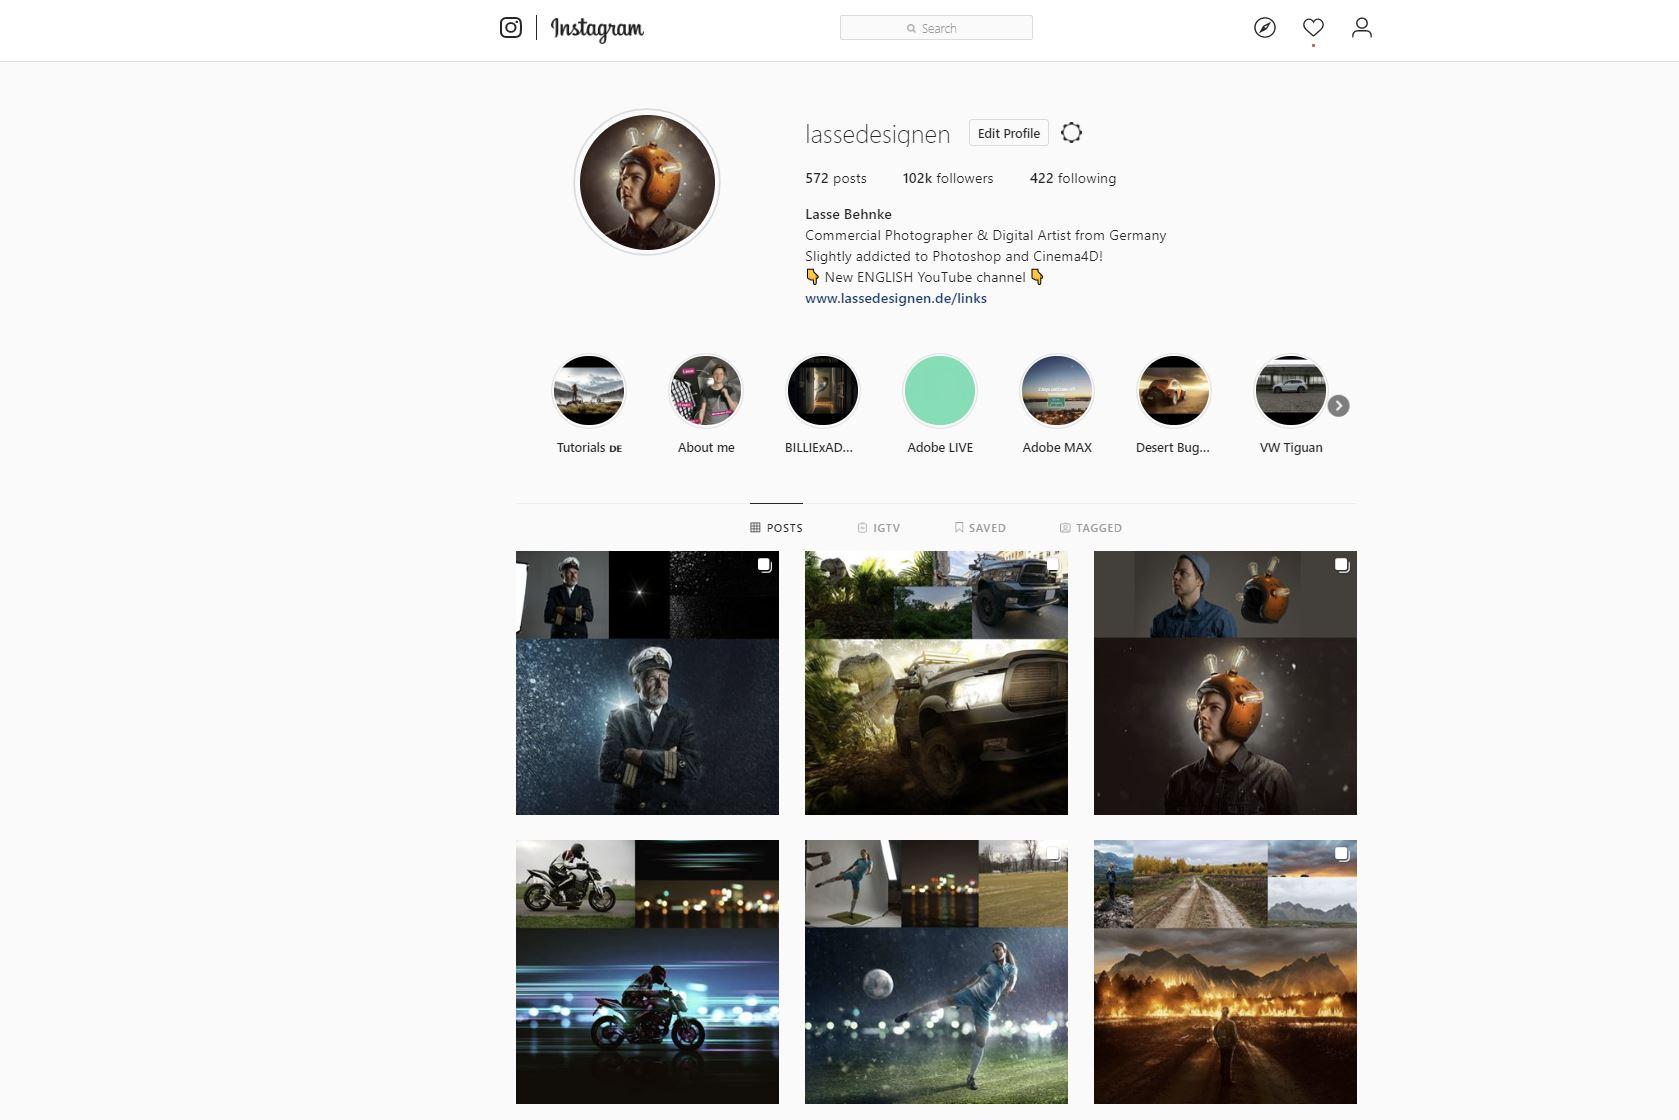 Milestone! 100,000 followers on Instagram